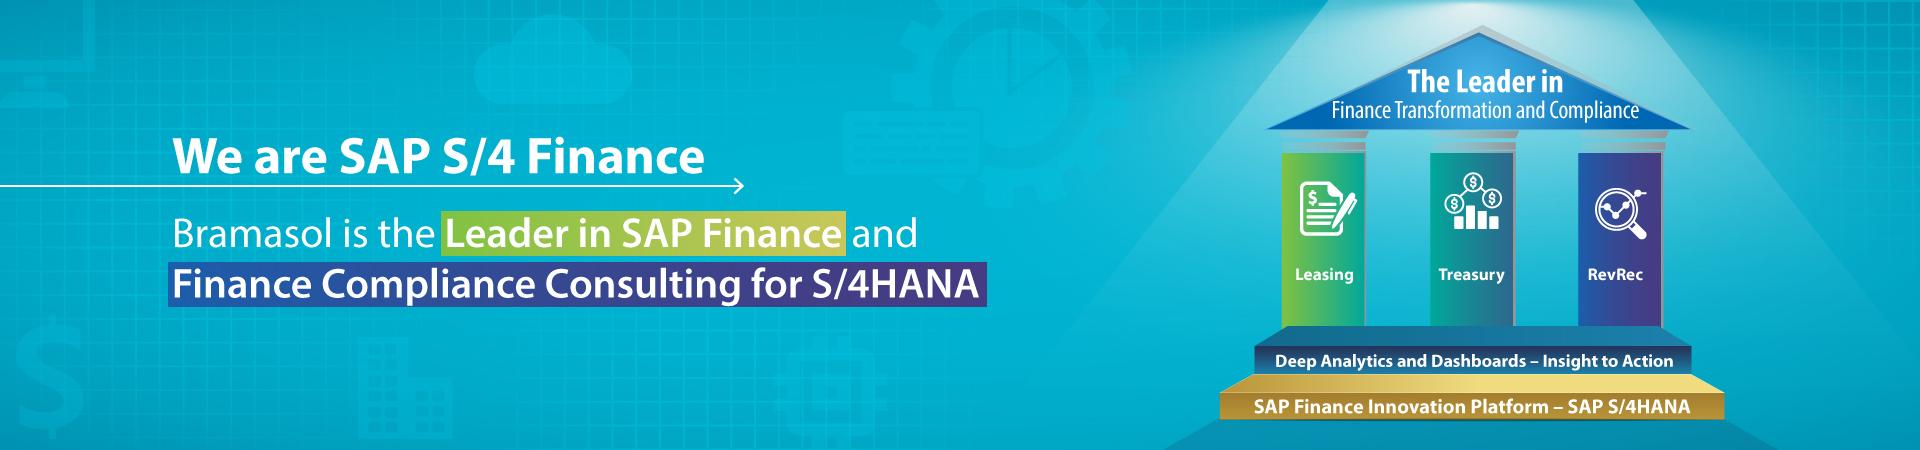 leader in SAP Finance